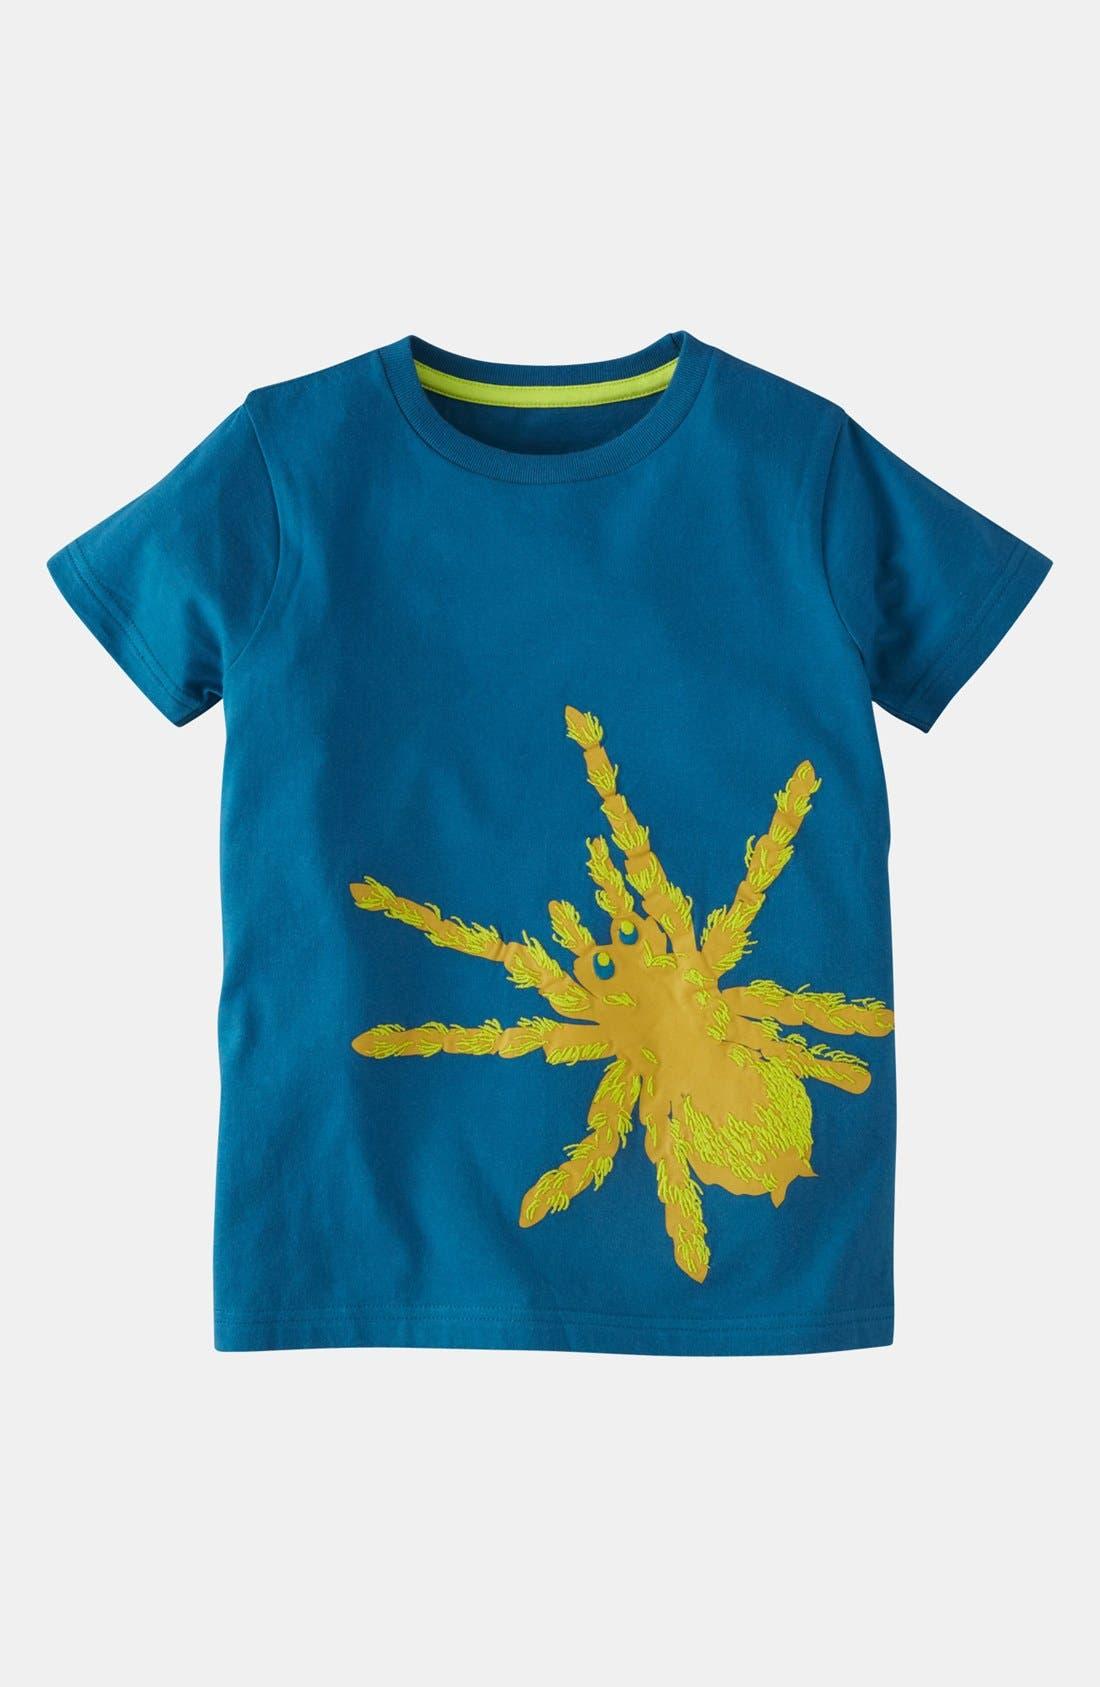 Alternate Image 1 Selected - Mini Boden 'Print & Stitch' T-Shirt (Toddler Boys)